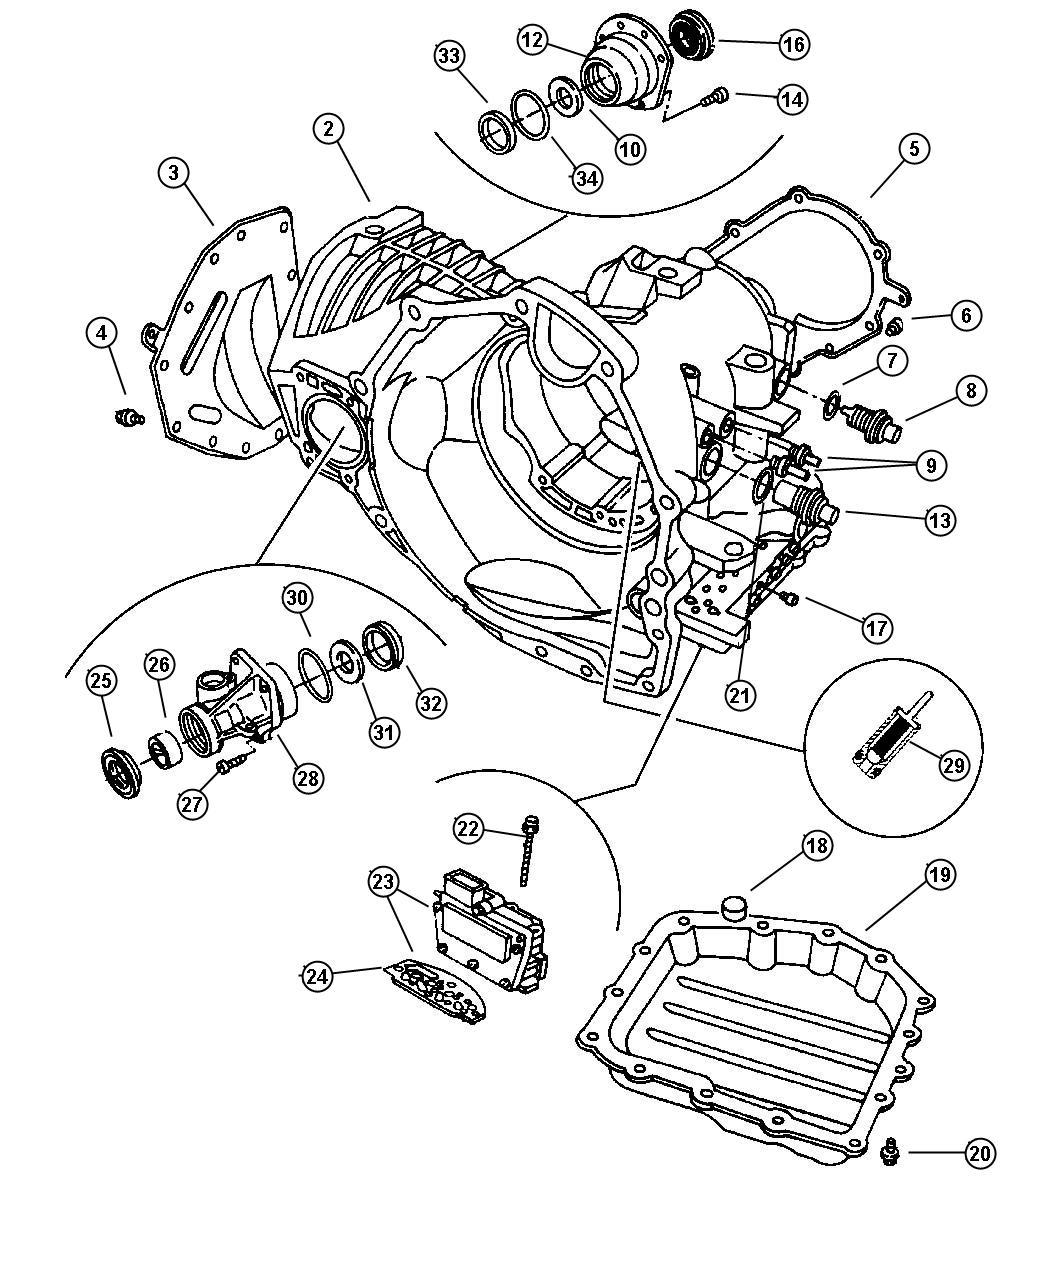 Chrysler Town & Country Solenoid module, solenoid package